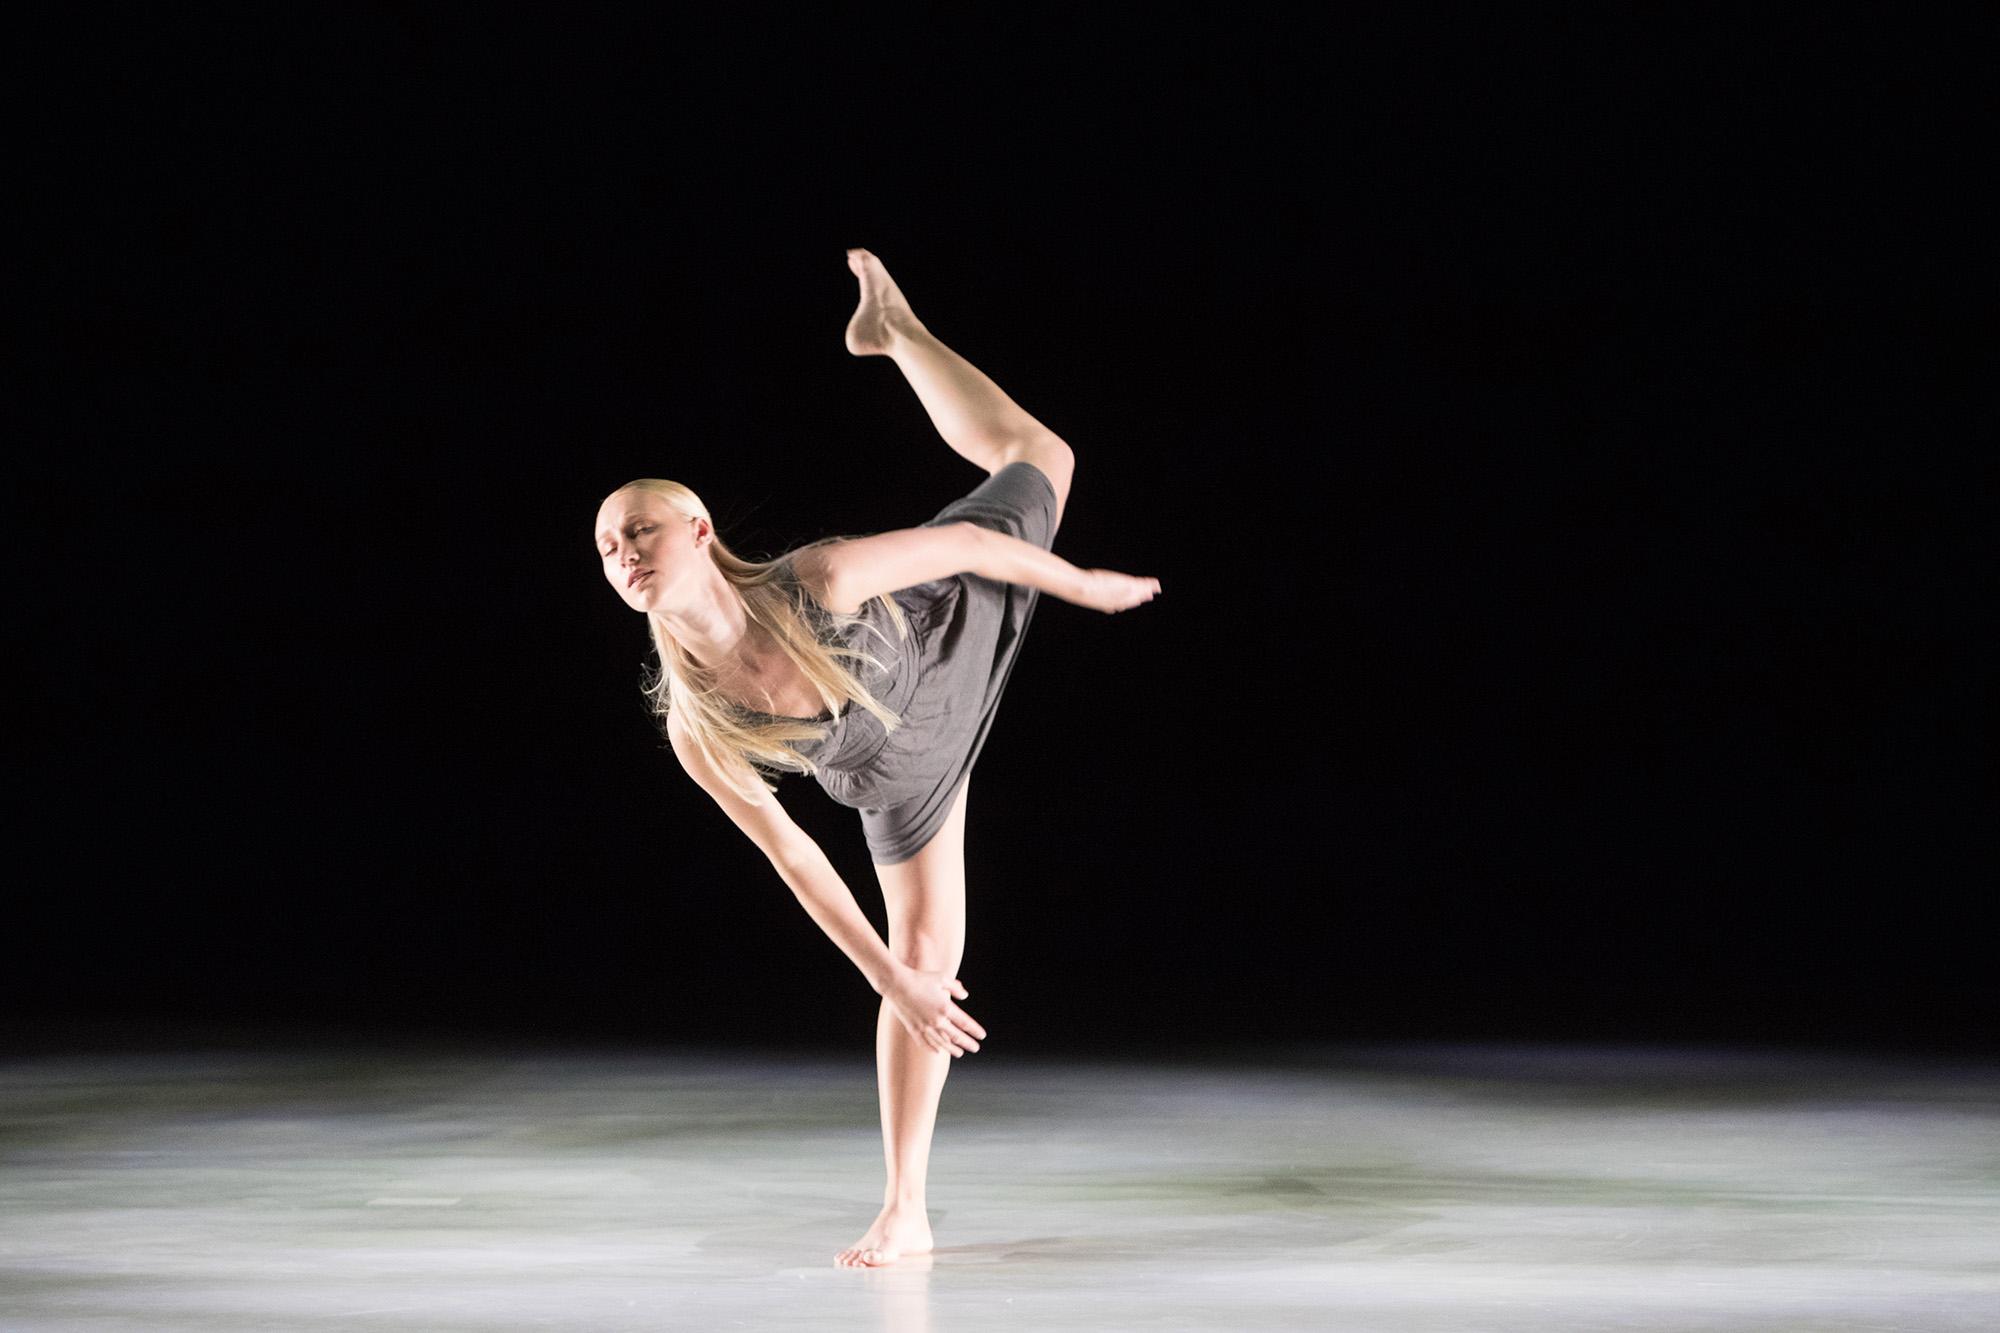 Student dancing onstage for Dansstage.